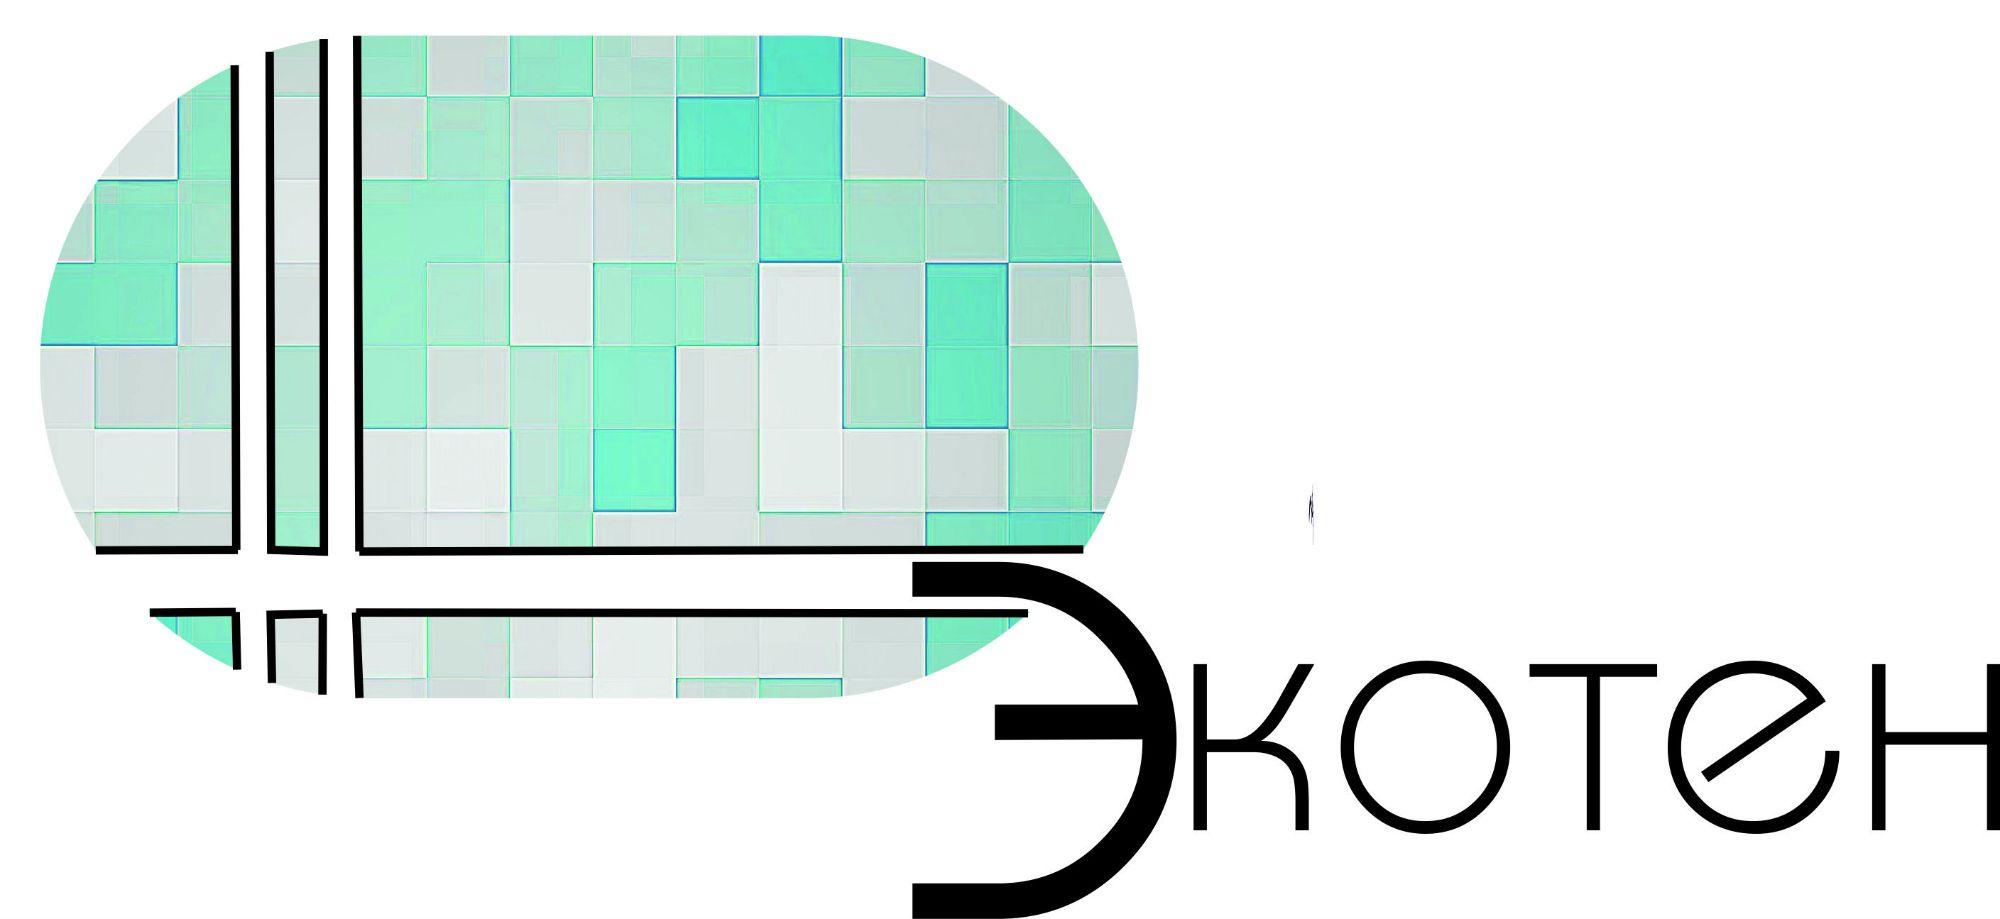 Логотип для научно - технического концерна - дизайнер Humanoid_007